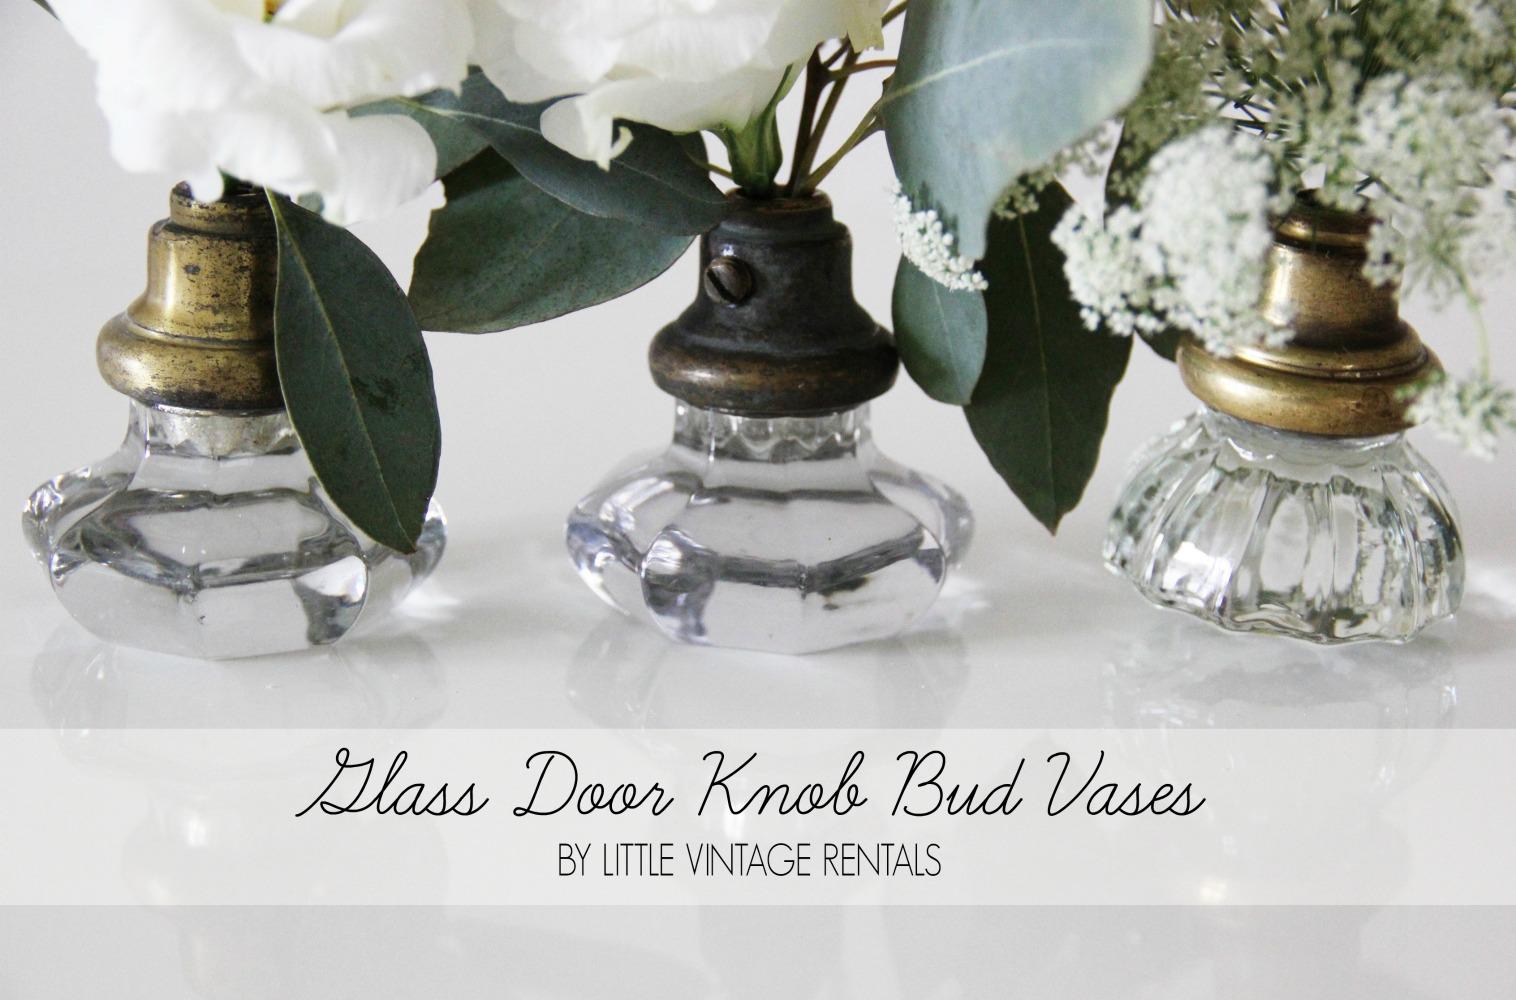 Diy glass door knob bud vases featured on wedding chicks pretty glass door knob diy by mandy forlenza sticos little vintage rentals nyc reviewsmspy